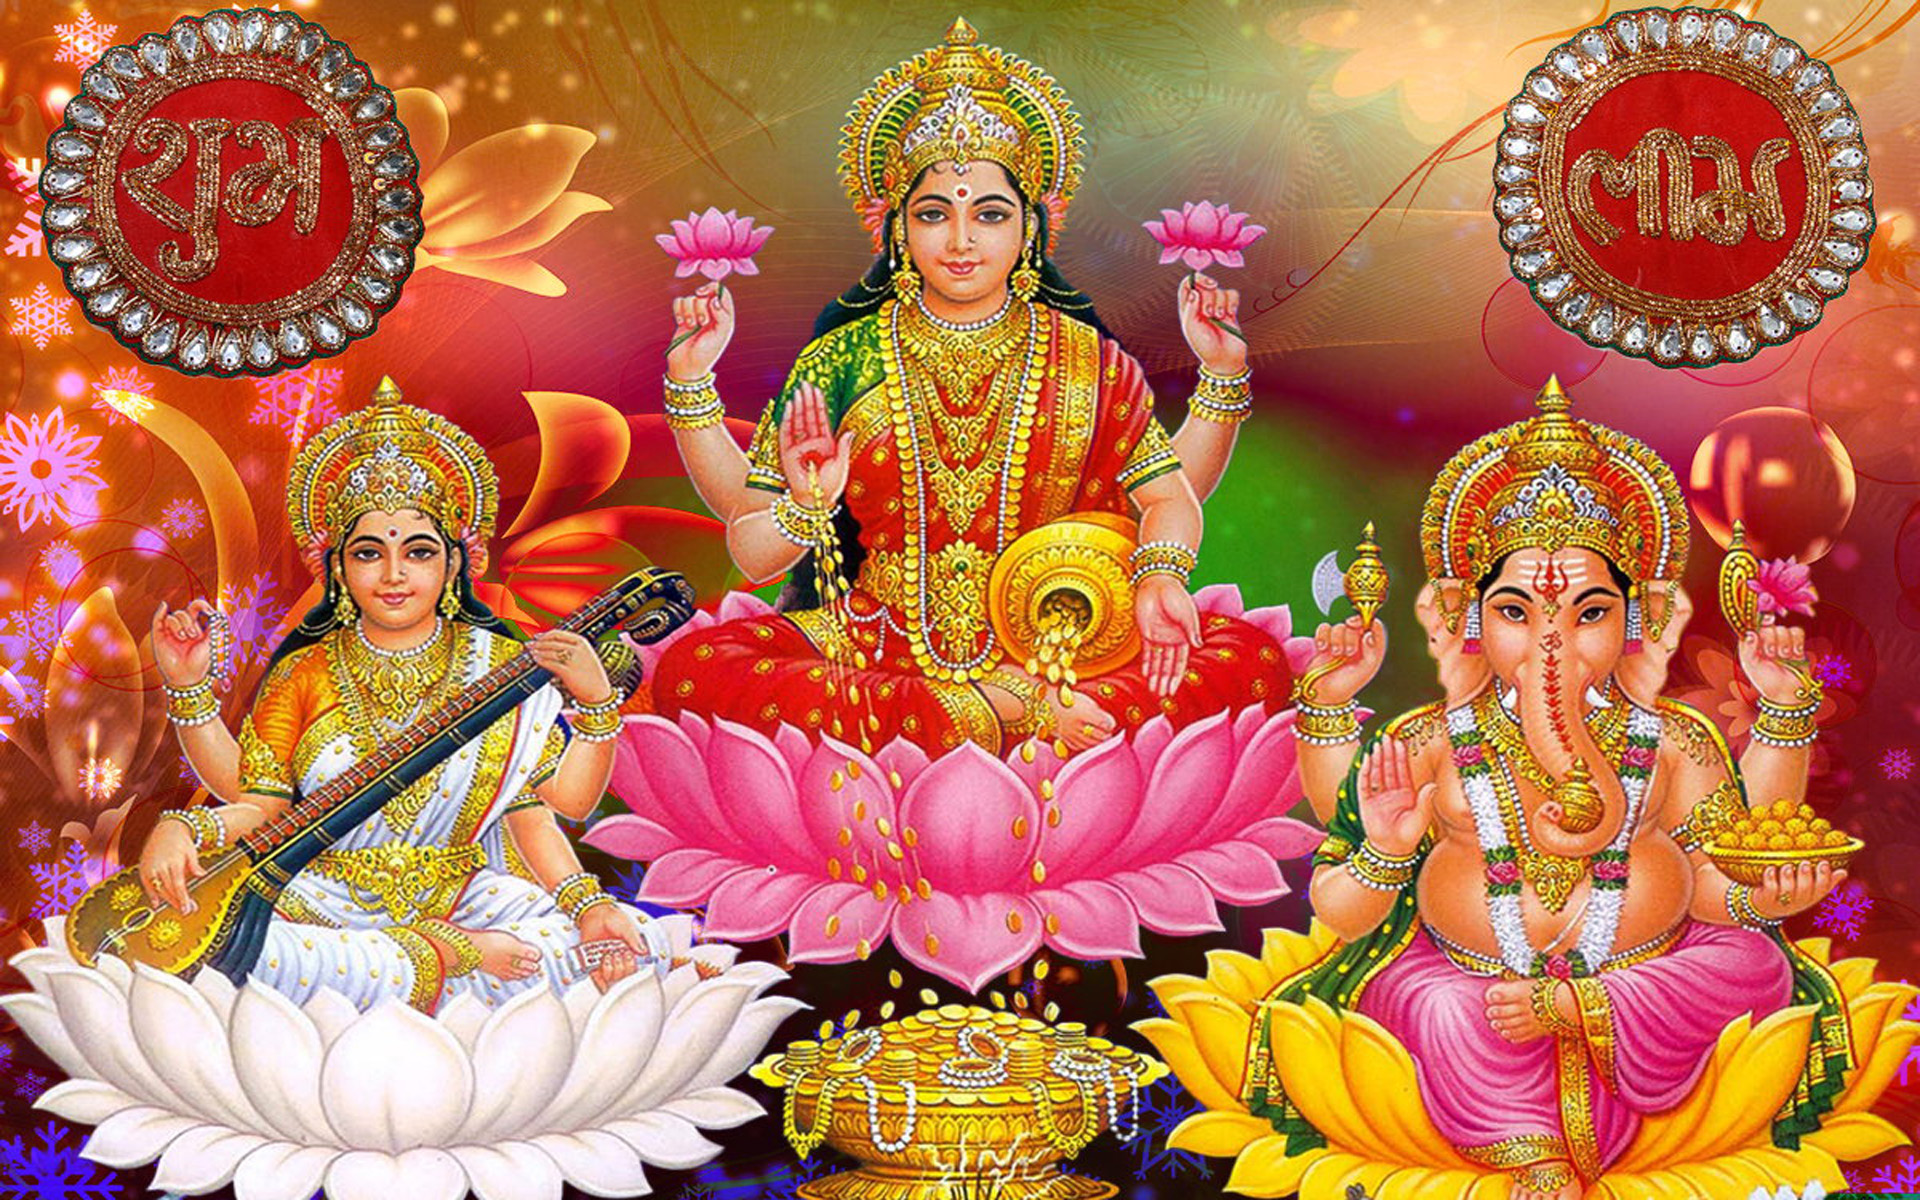 Siddhivinayak Hd Wallpaper Download Laxmi Ganesh Wallpapers Beautiful Images Free Download